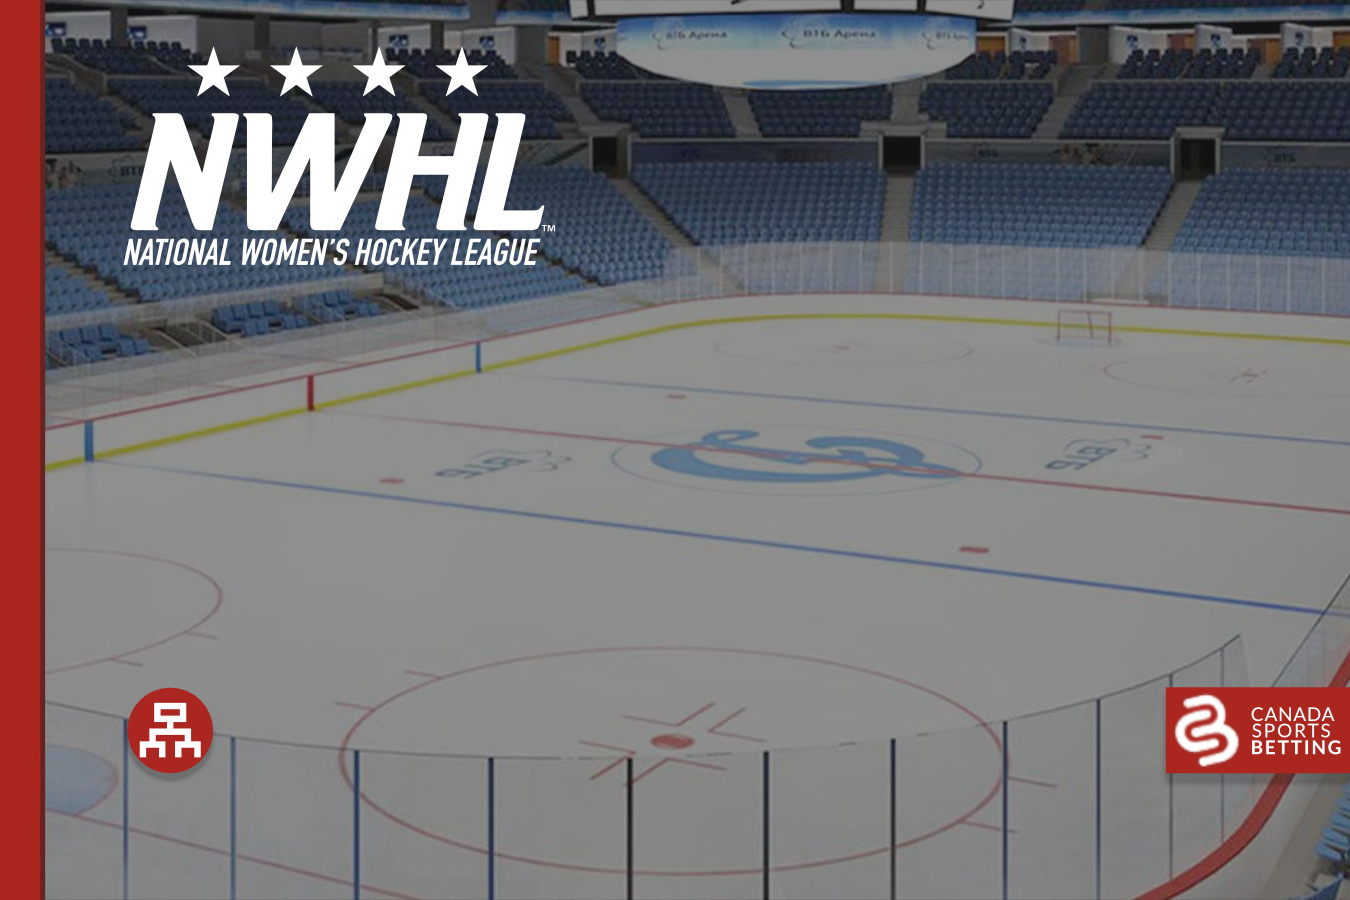 Can the Toronto Six win the NWHL League?